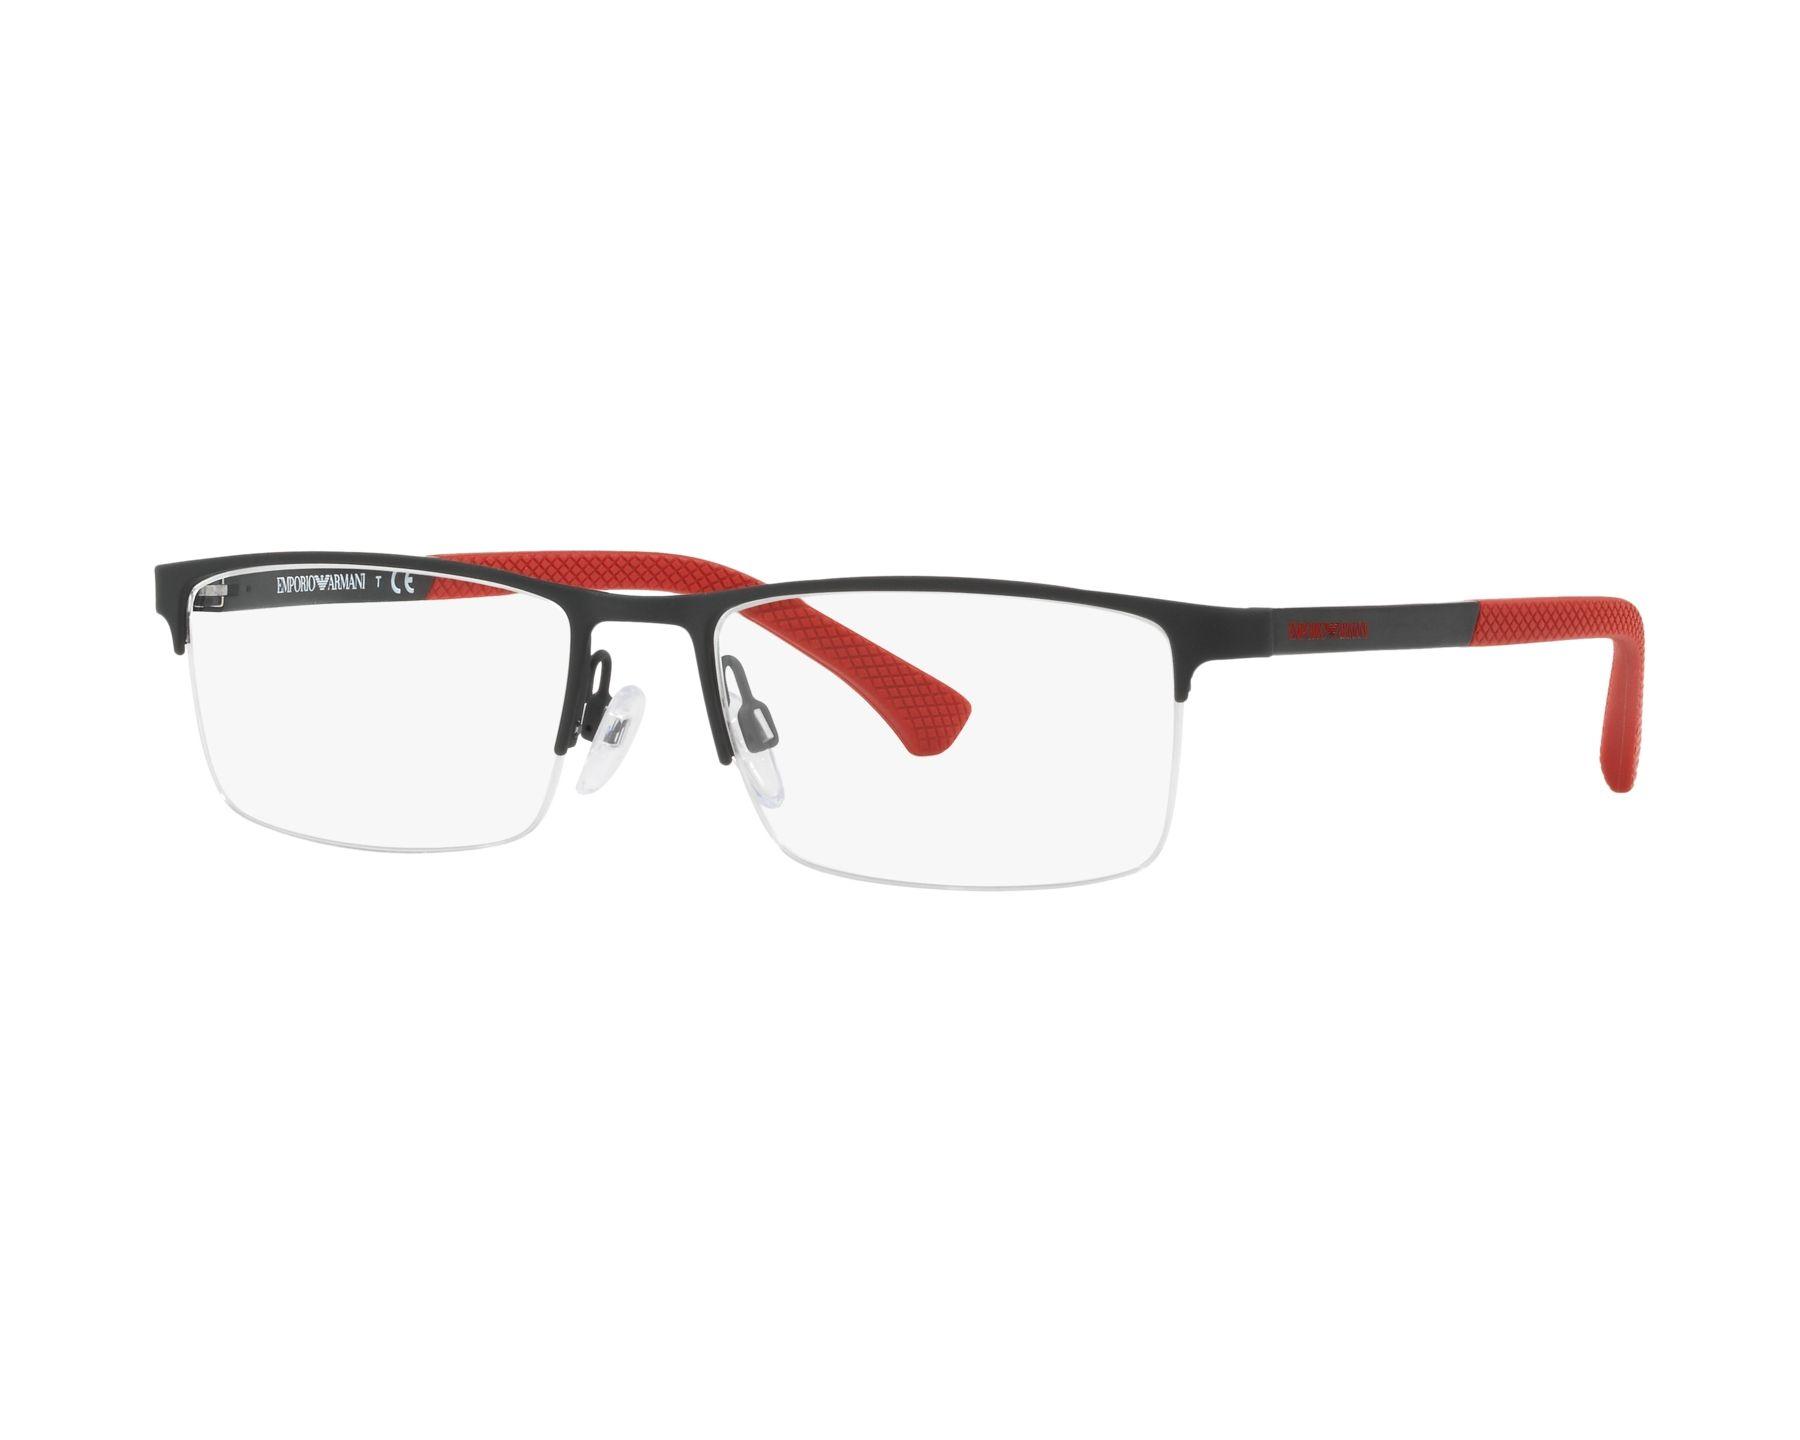 eyeglasses Emporio Armani EA-1041 3109 53-17 Black Red e025542bb4c5